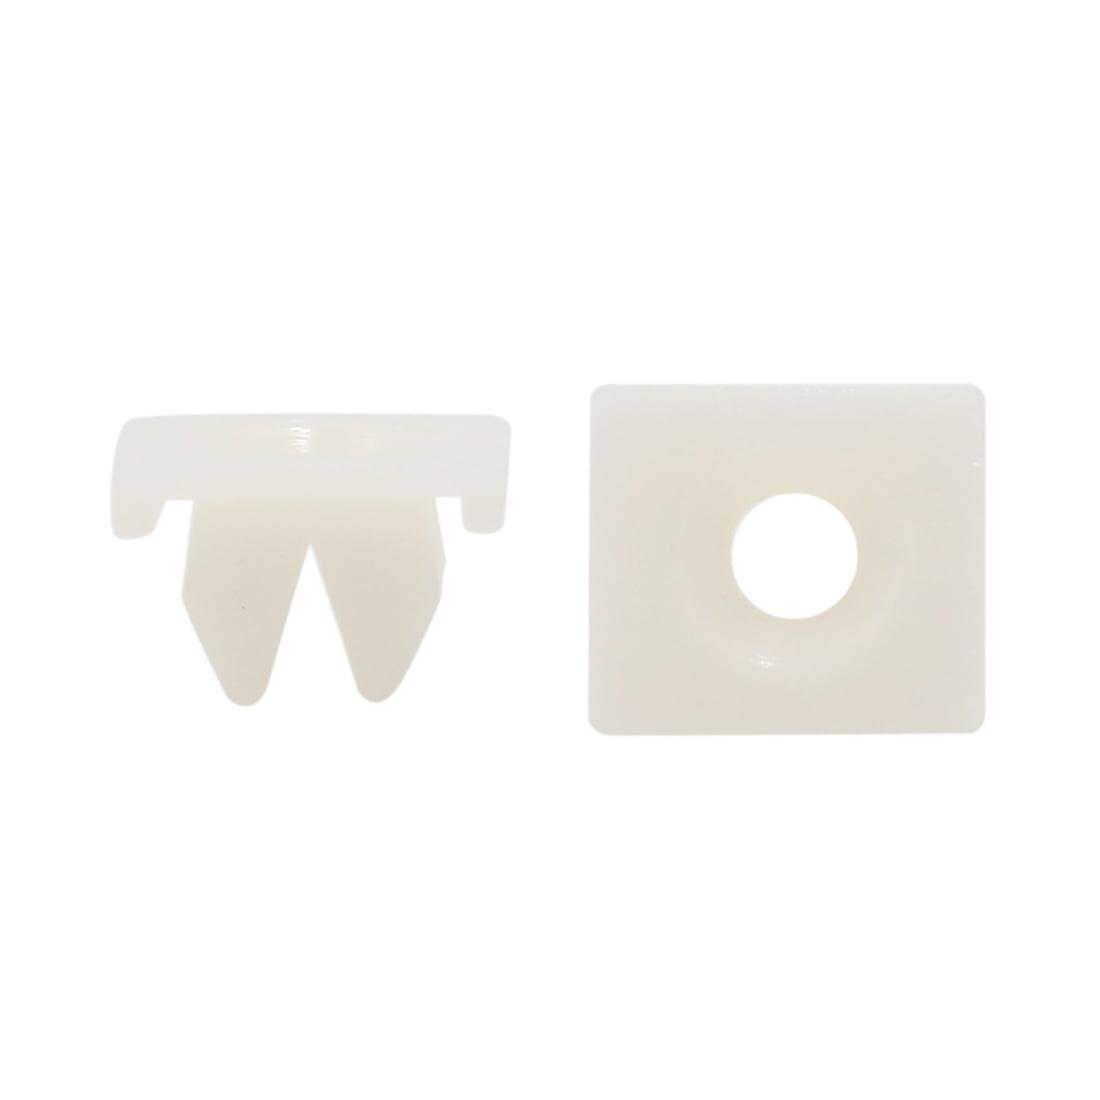 30Pcs Universal White Plastic Rivet Car Trim Panel Hood Fastener 11 x 11mm Hole